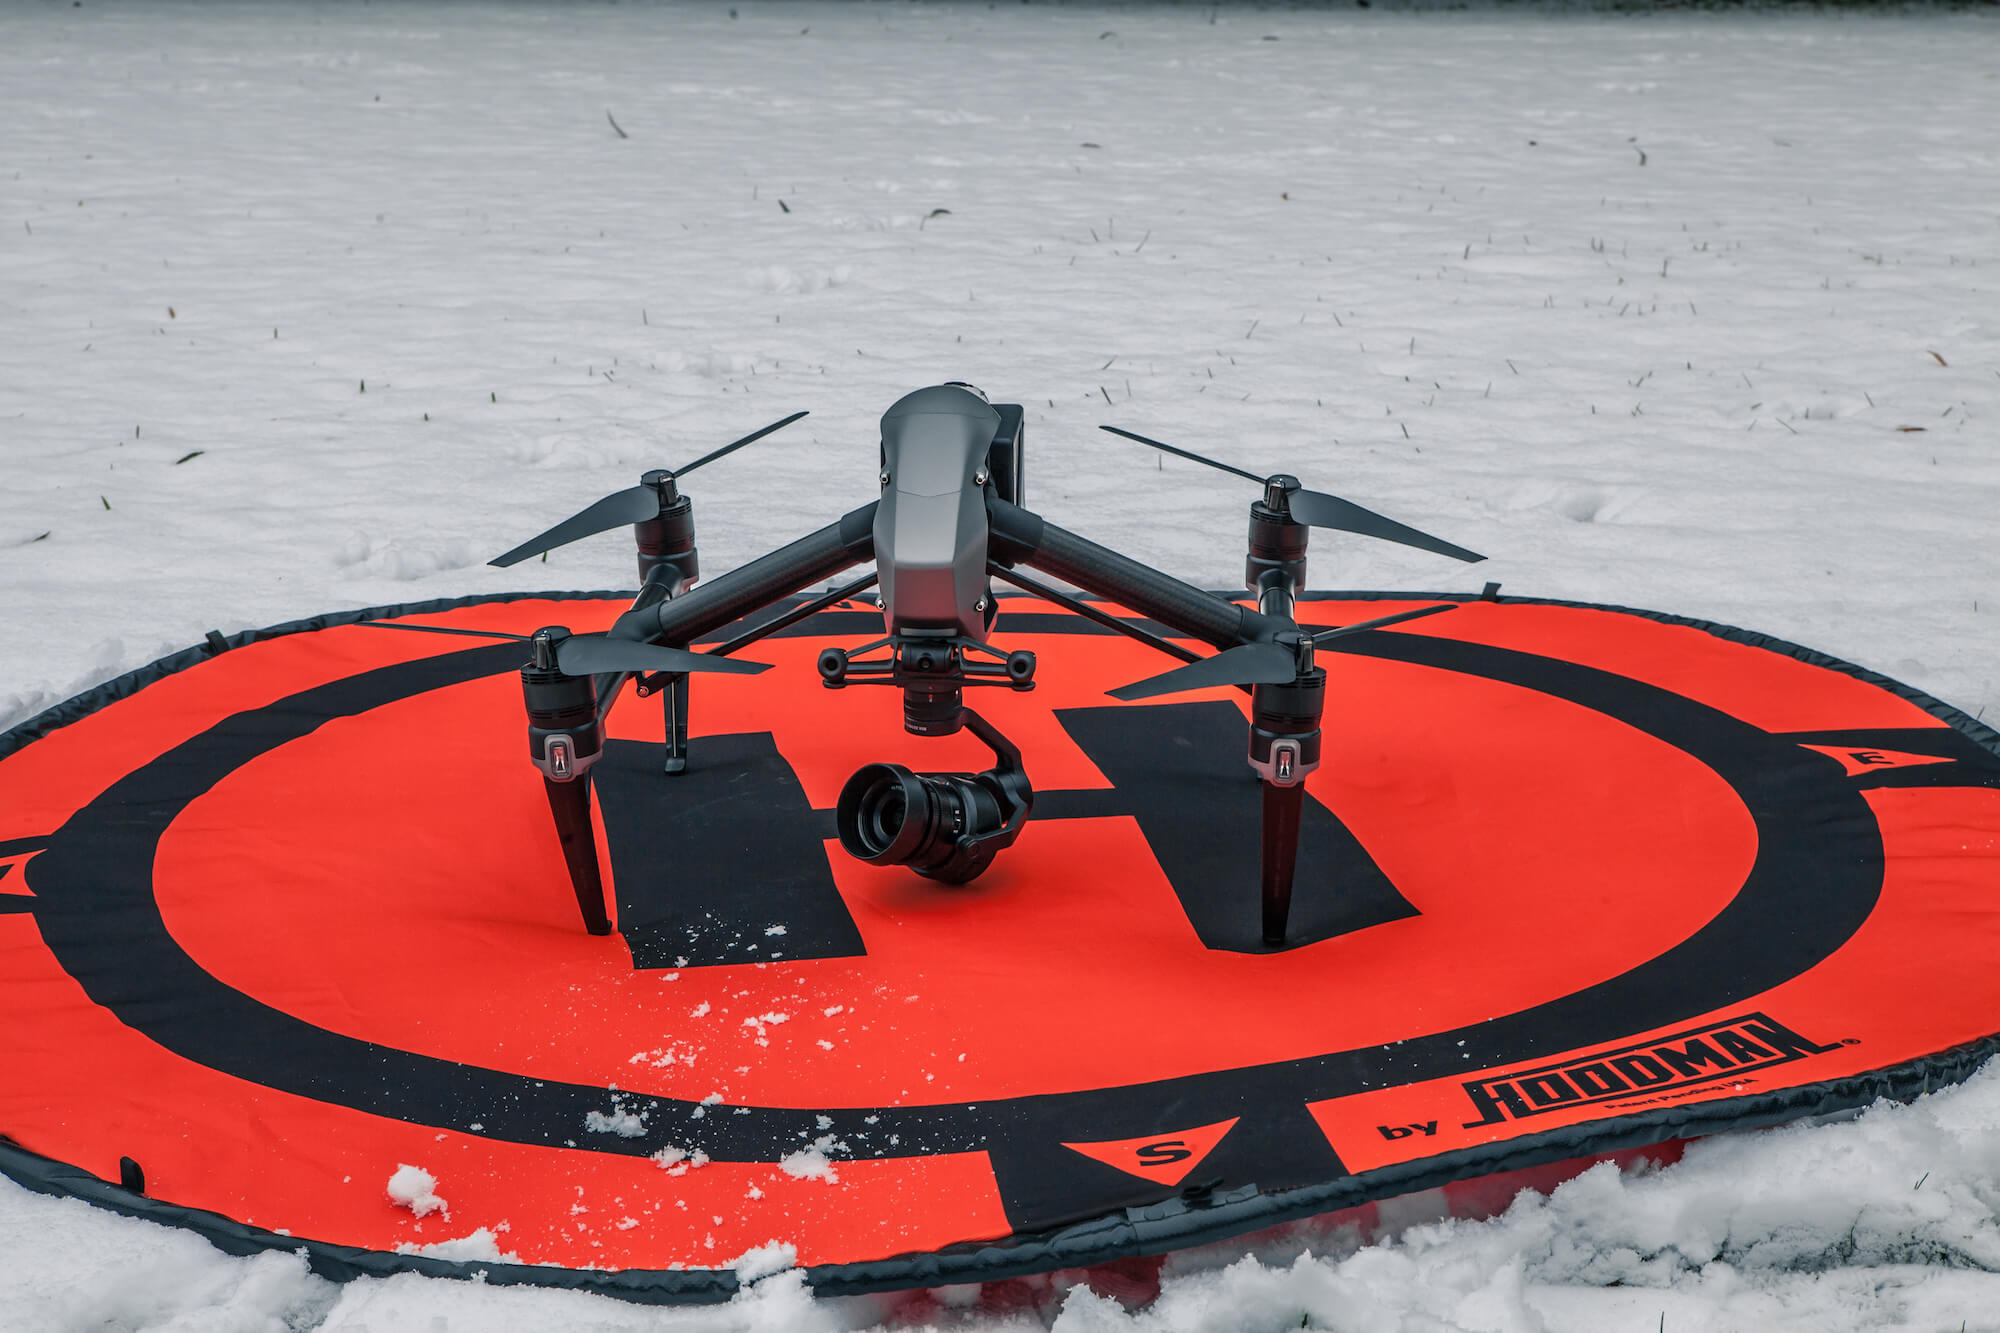 Justen Soule - Photo 3 - Drone Landing Pad